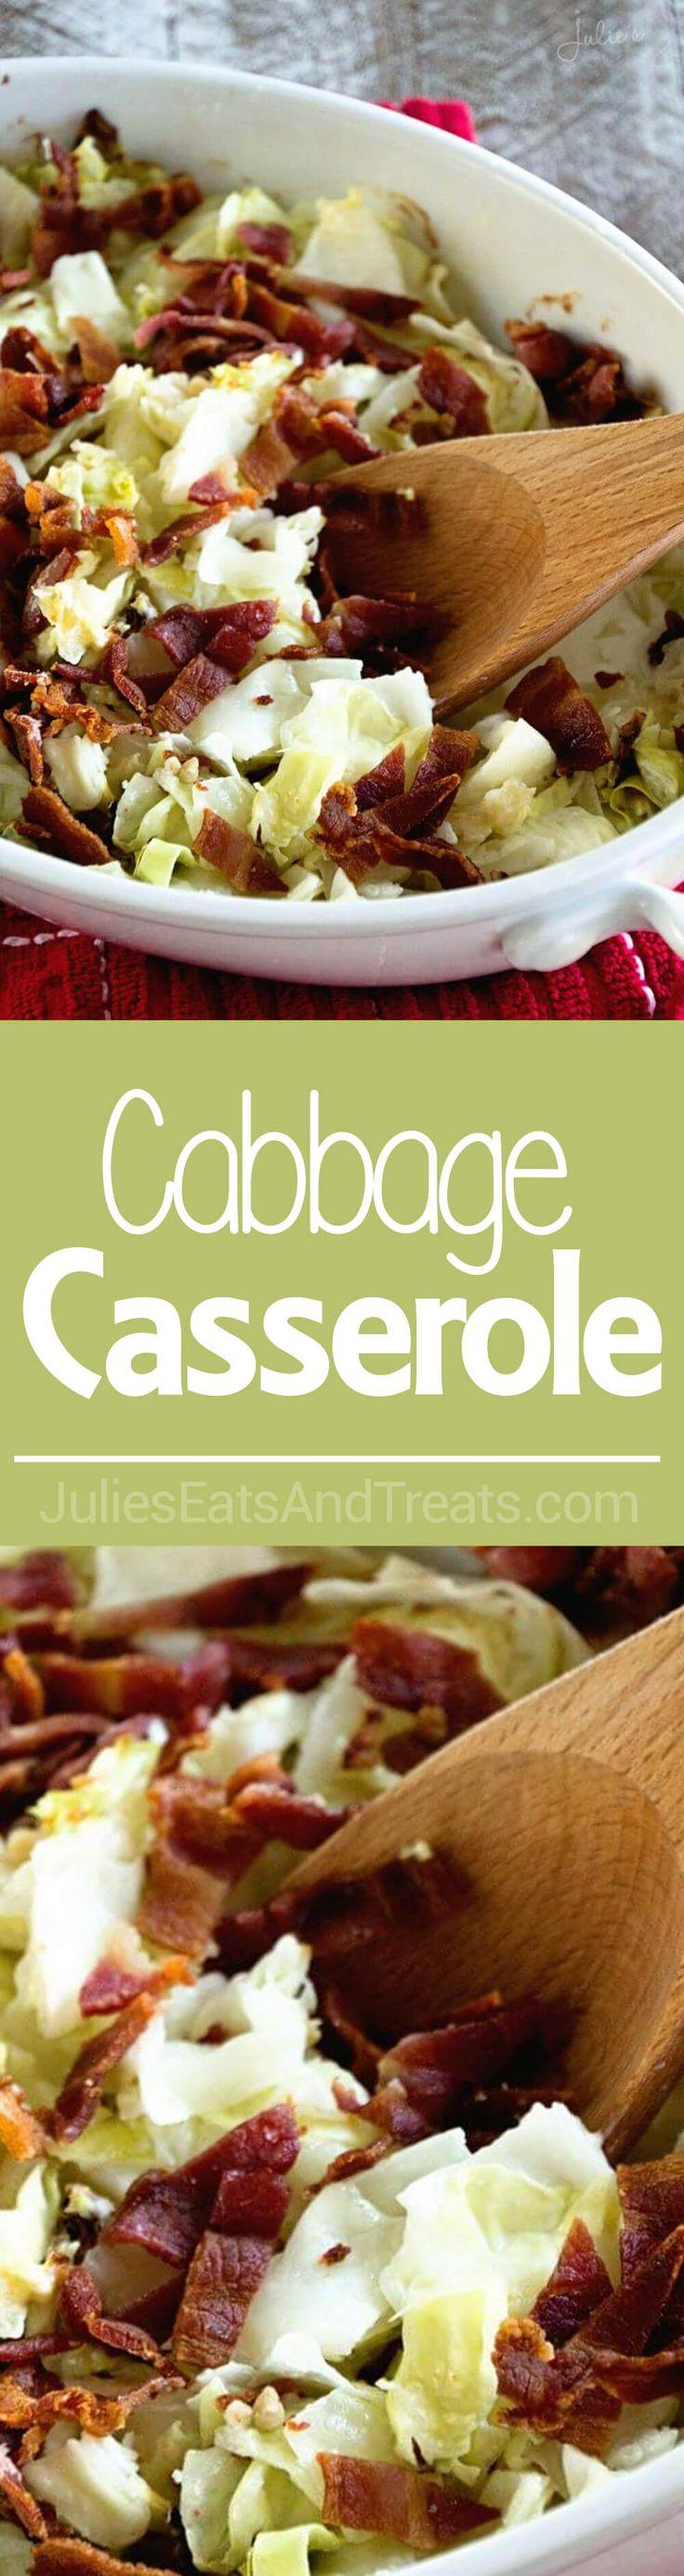 Easy cabbage casserole recipes